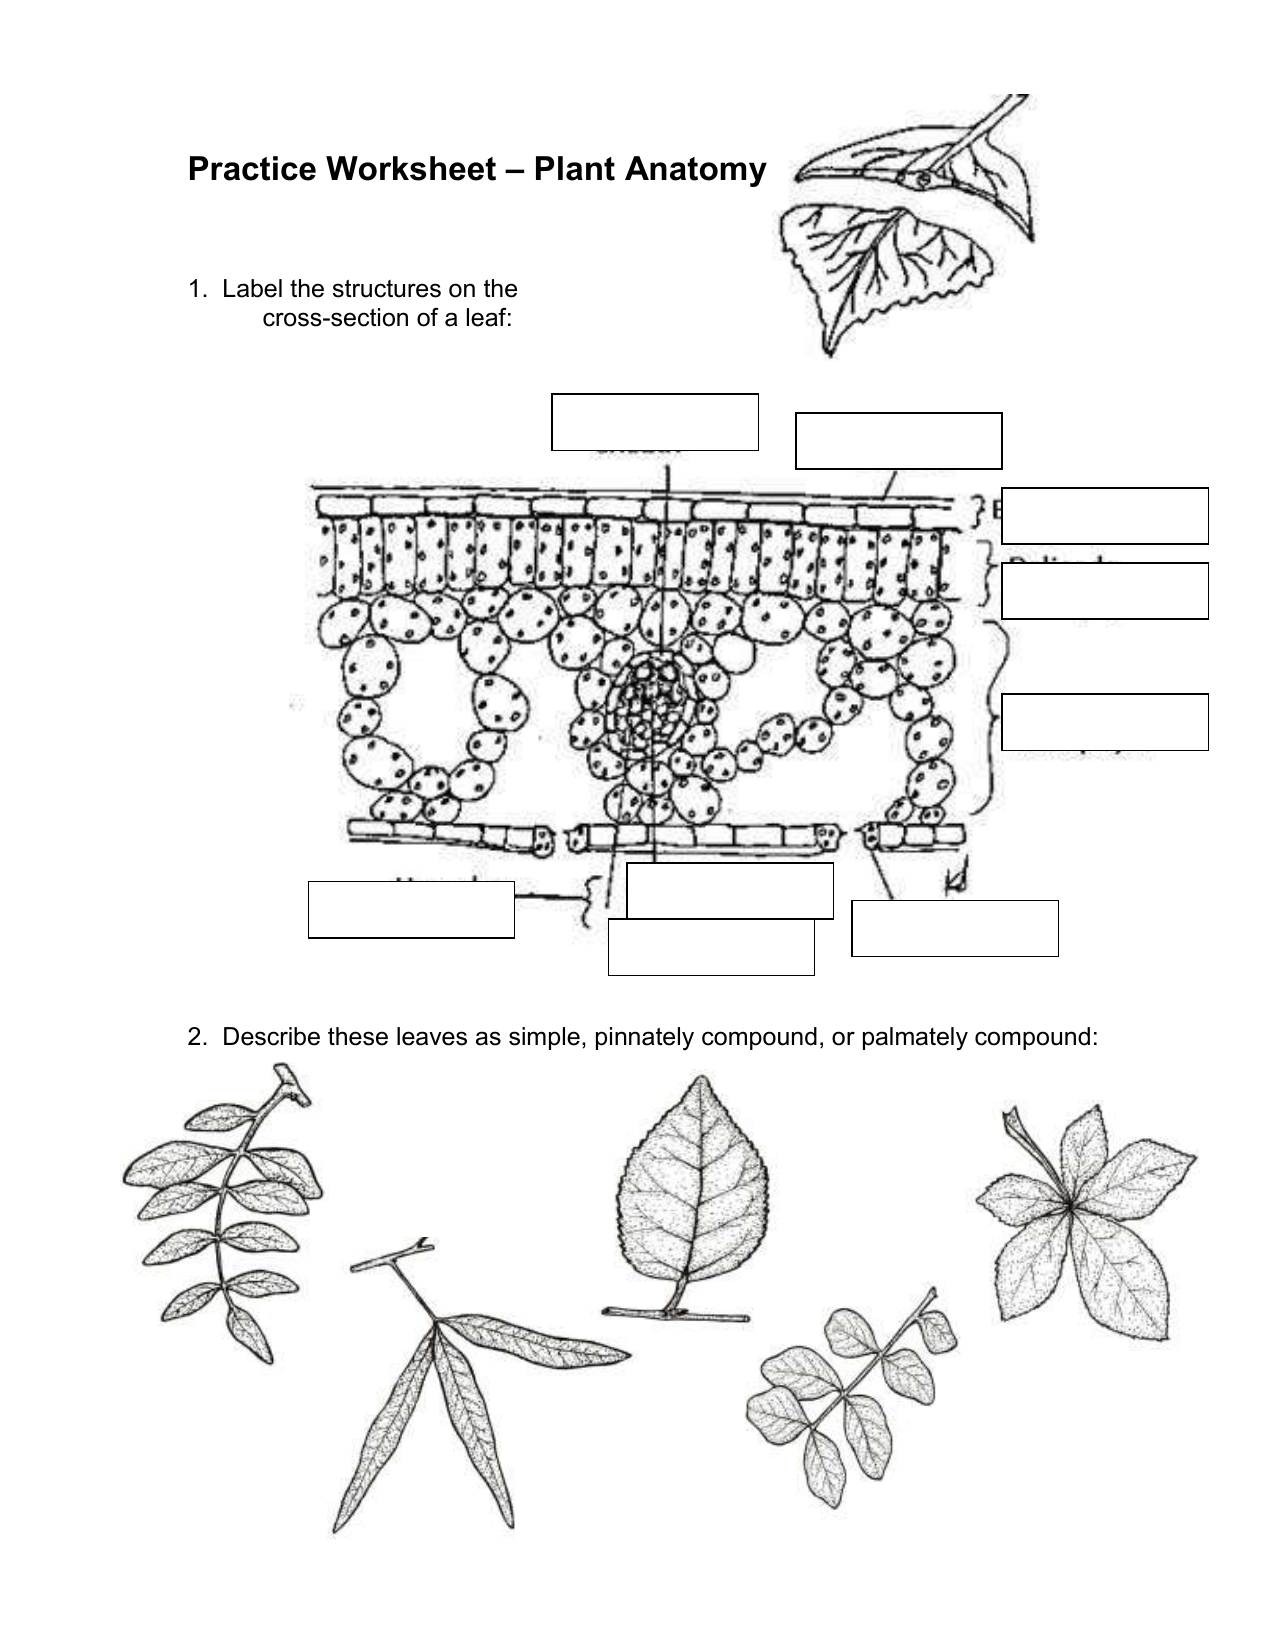 Plant Anatomy (2)